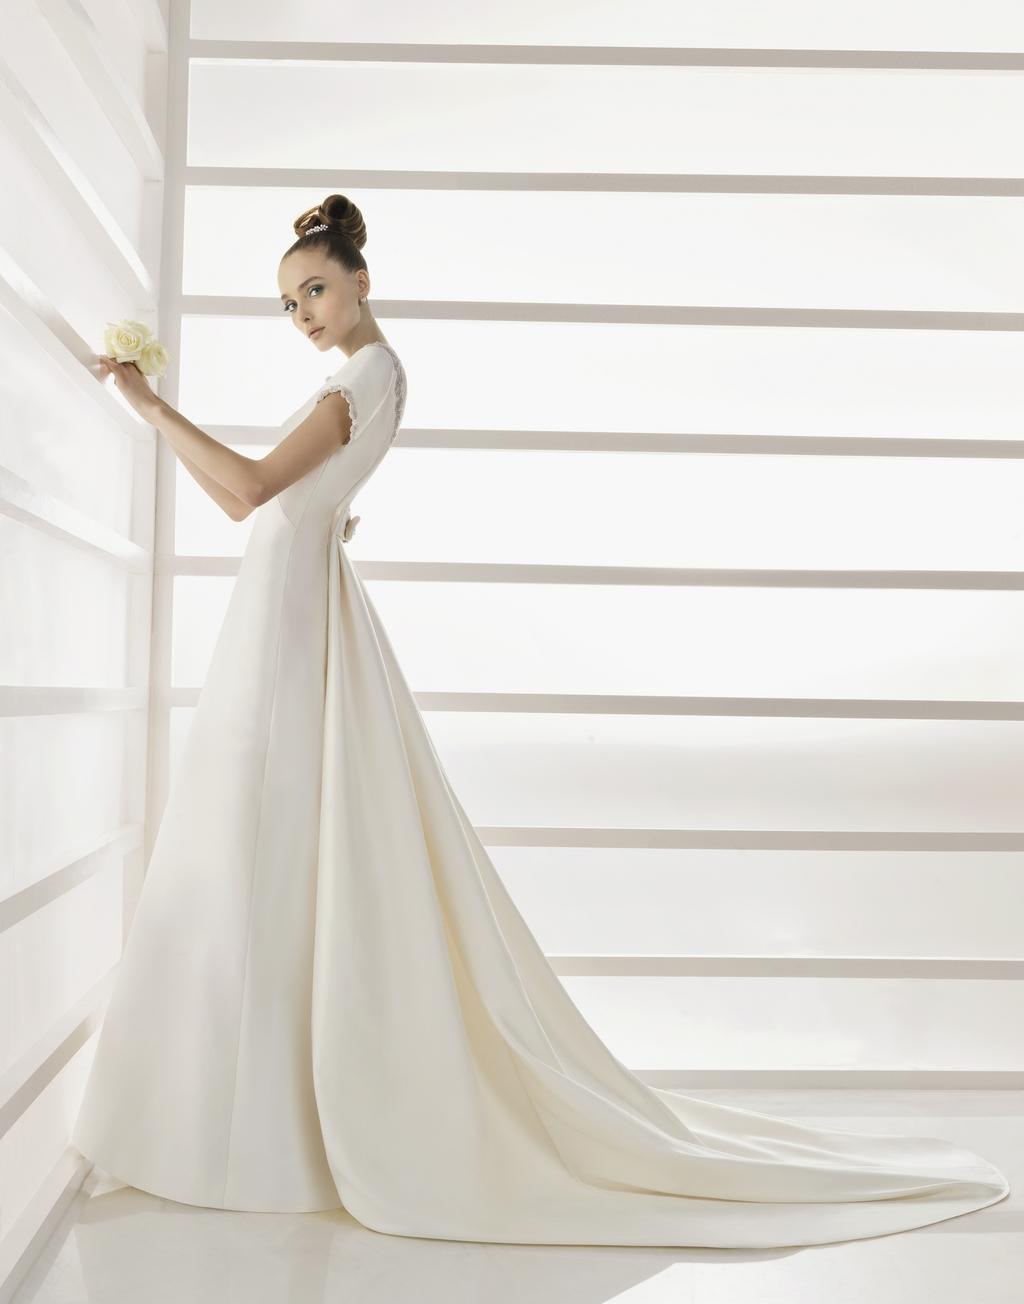 217-eire-2011-rosa-clara-wedding-dress-ivory-cap-sleeves-full-a-line-side.full